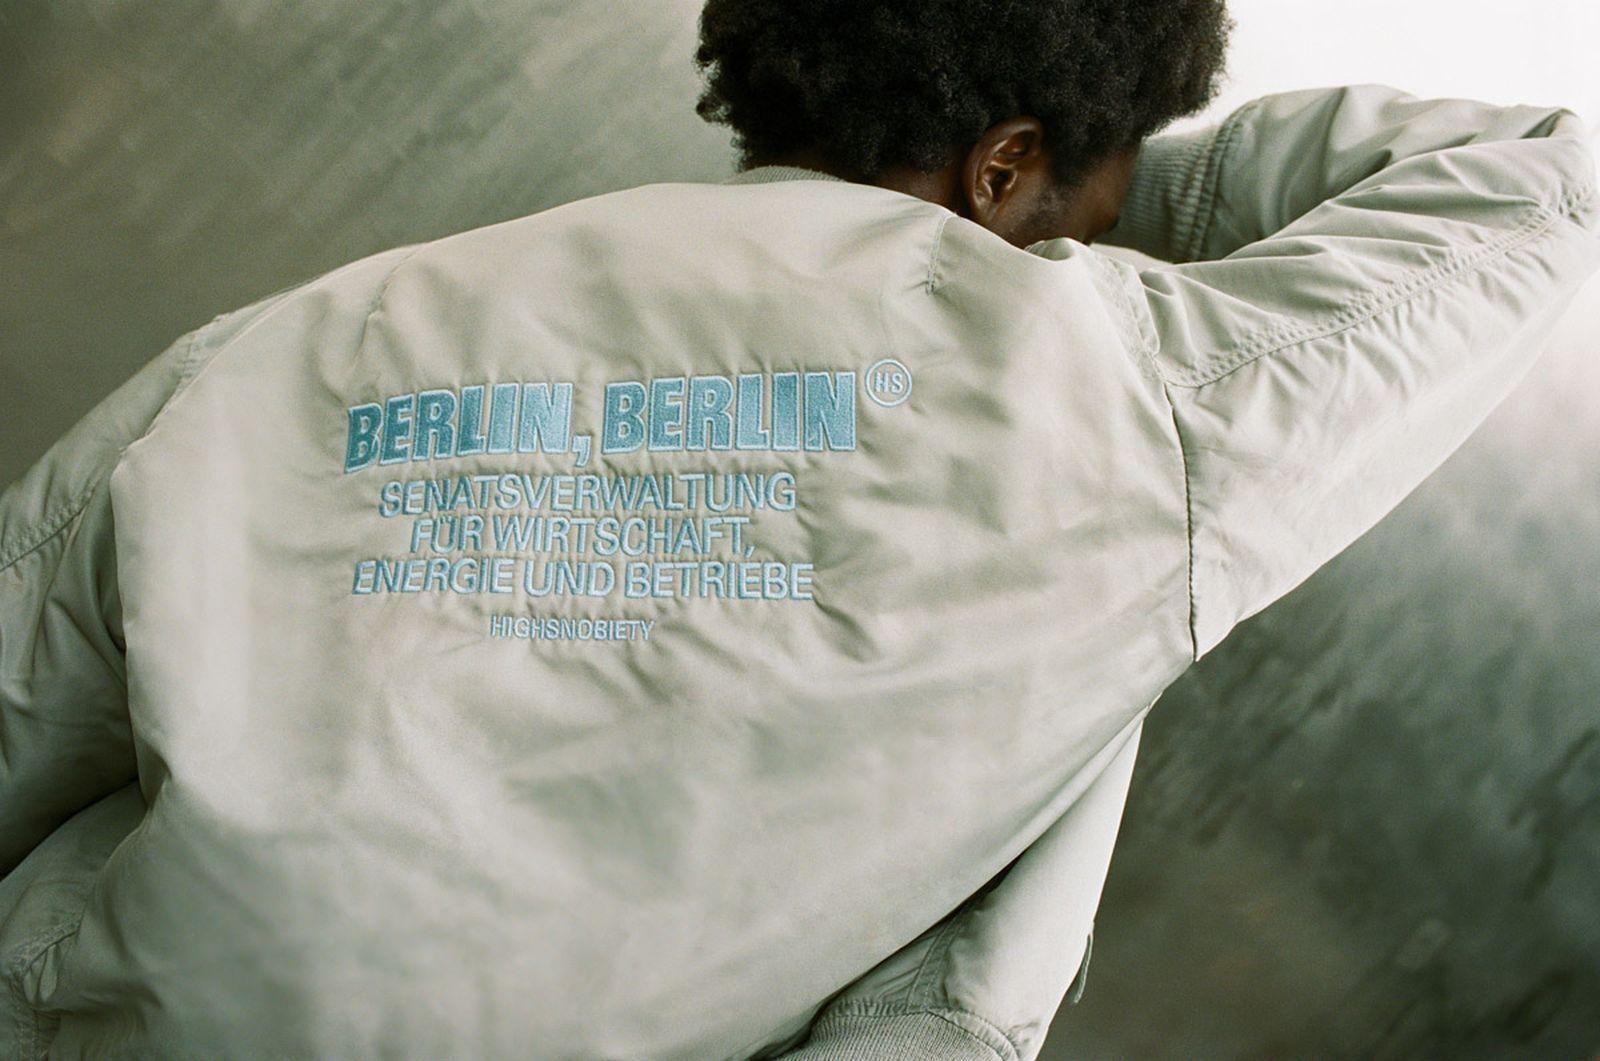 berlin-berlin-merch-lookbook-014